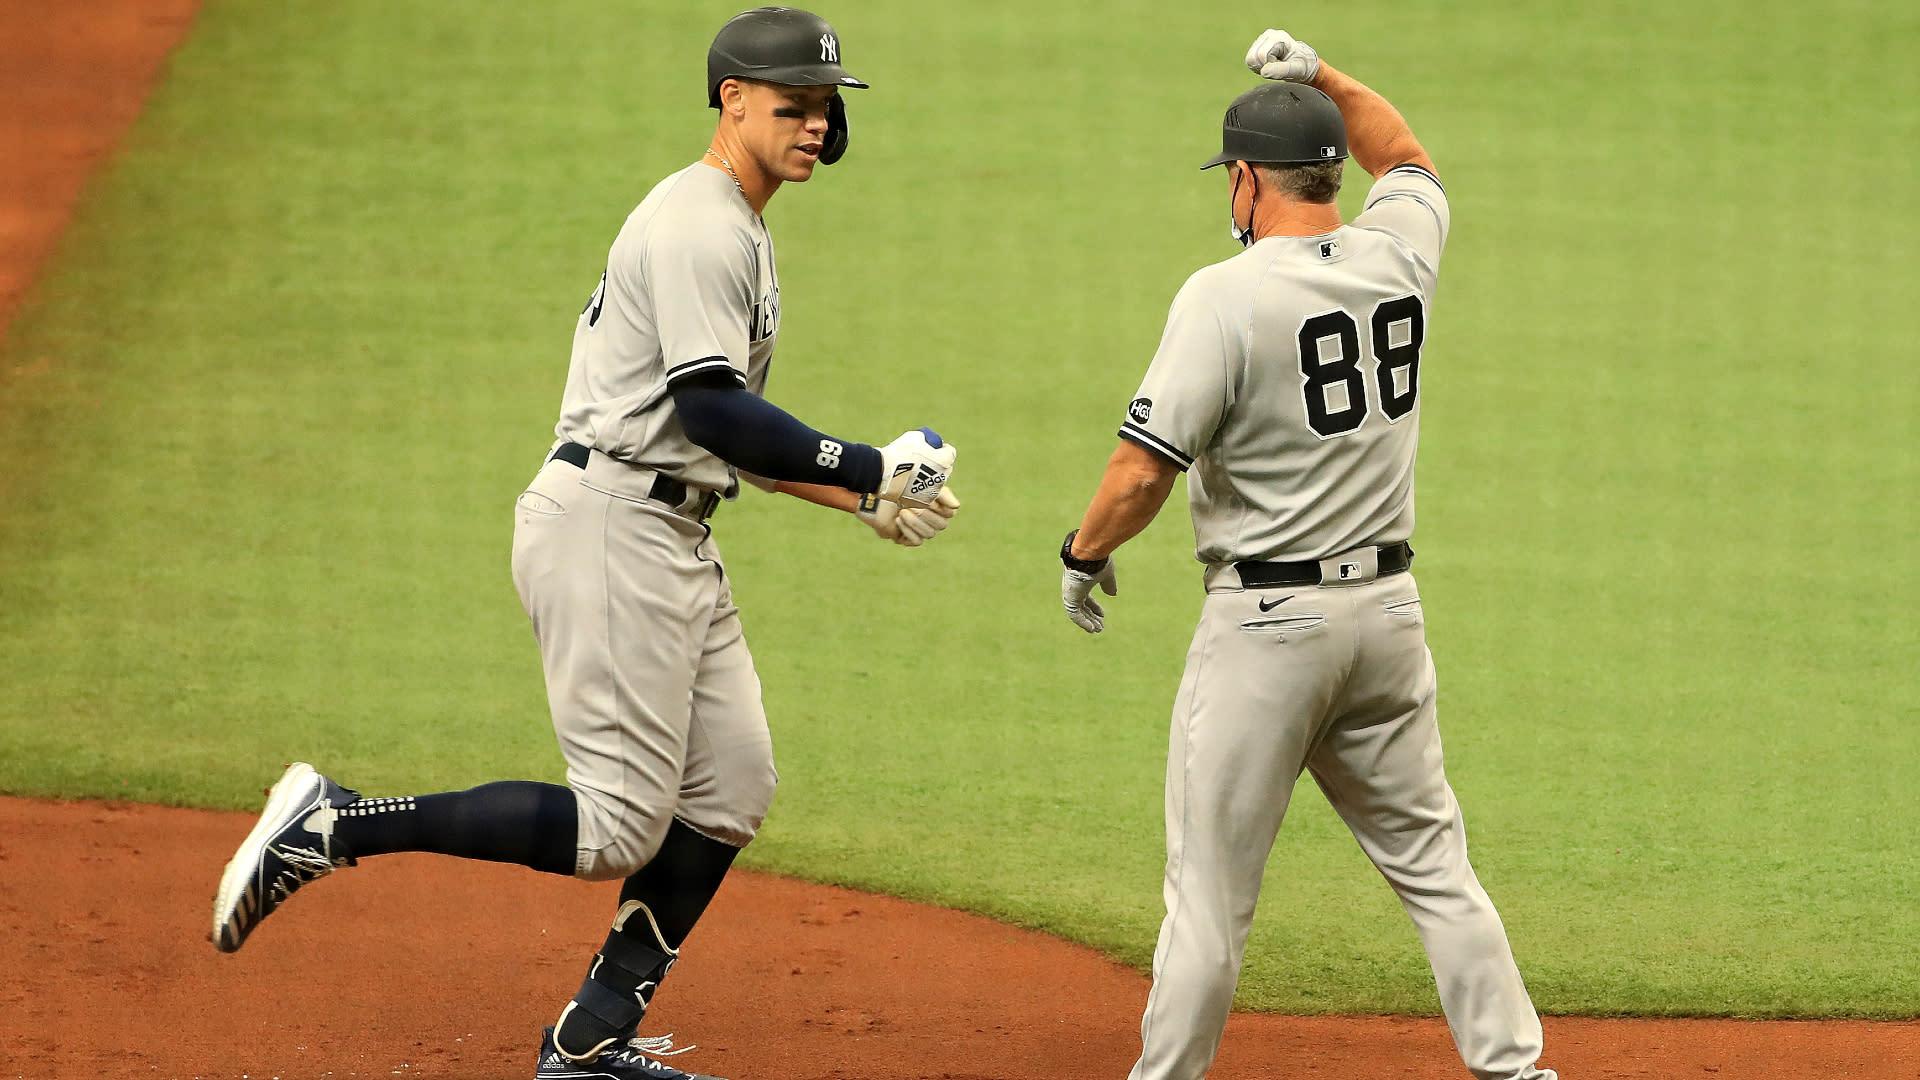 Judge crushes another home run in Yankees' win, Scherzer shines